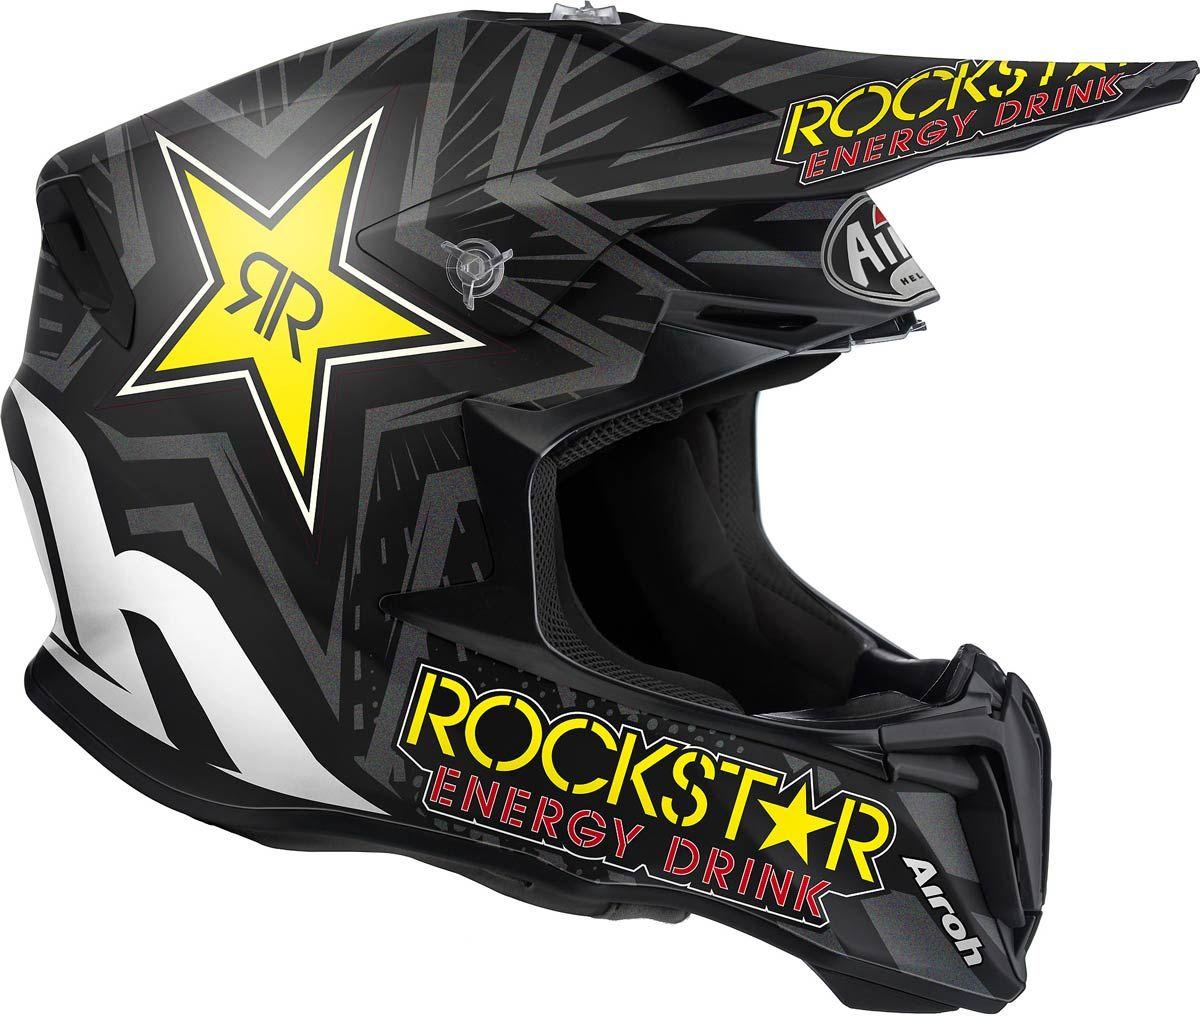 Casco moto cross Airoh Twist rockstar motard enduro helmet helm casque